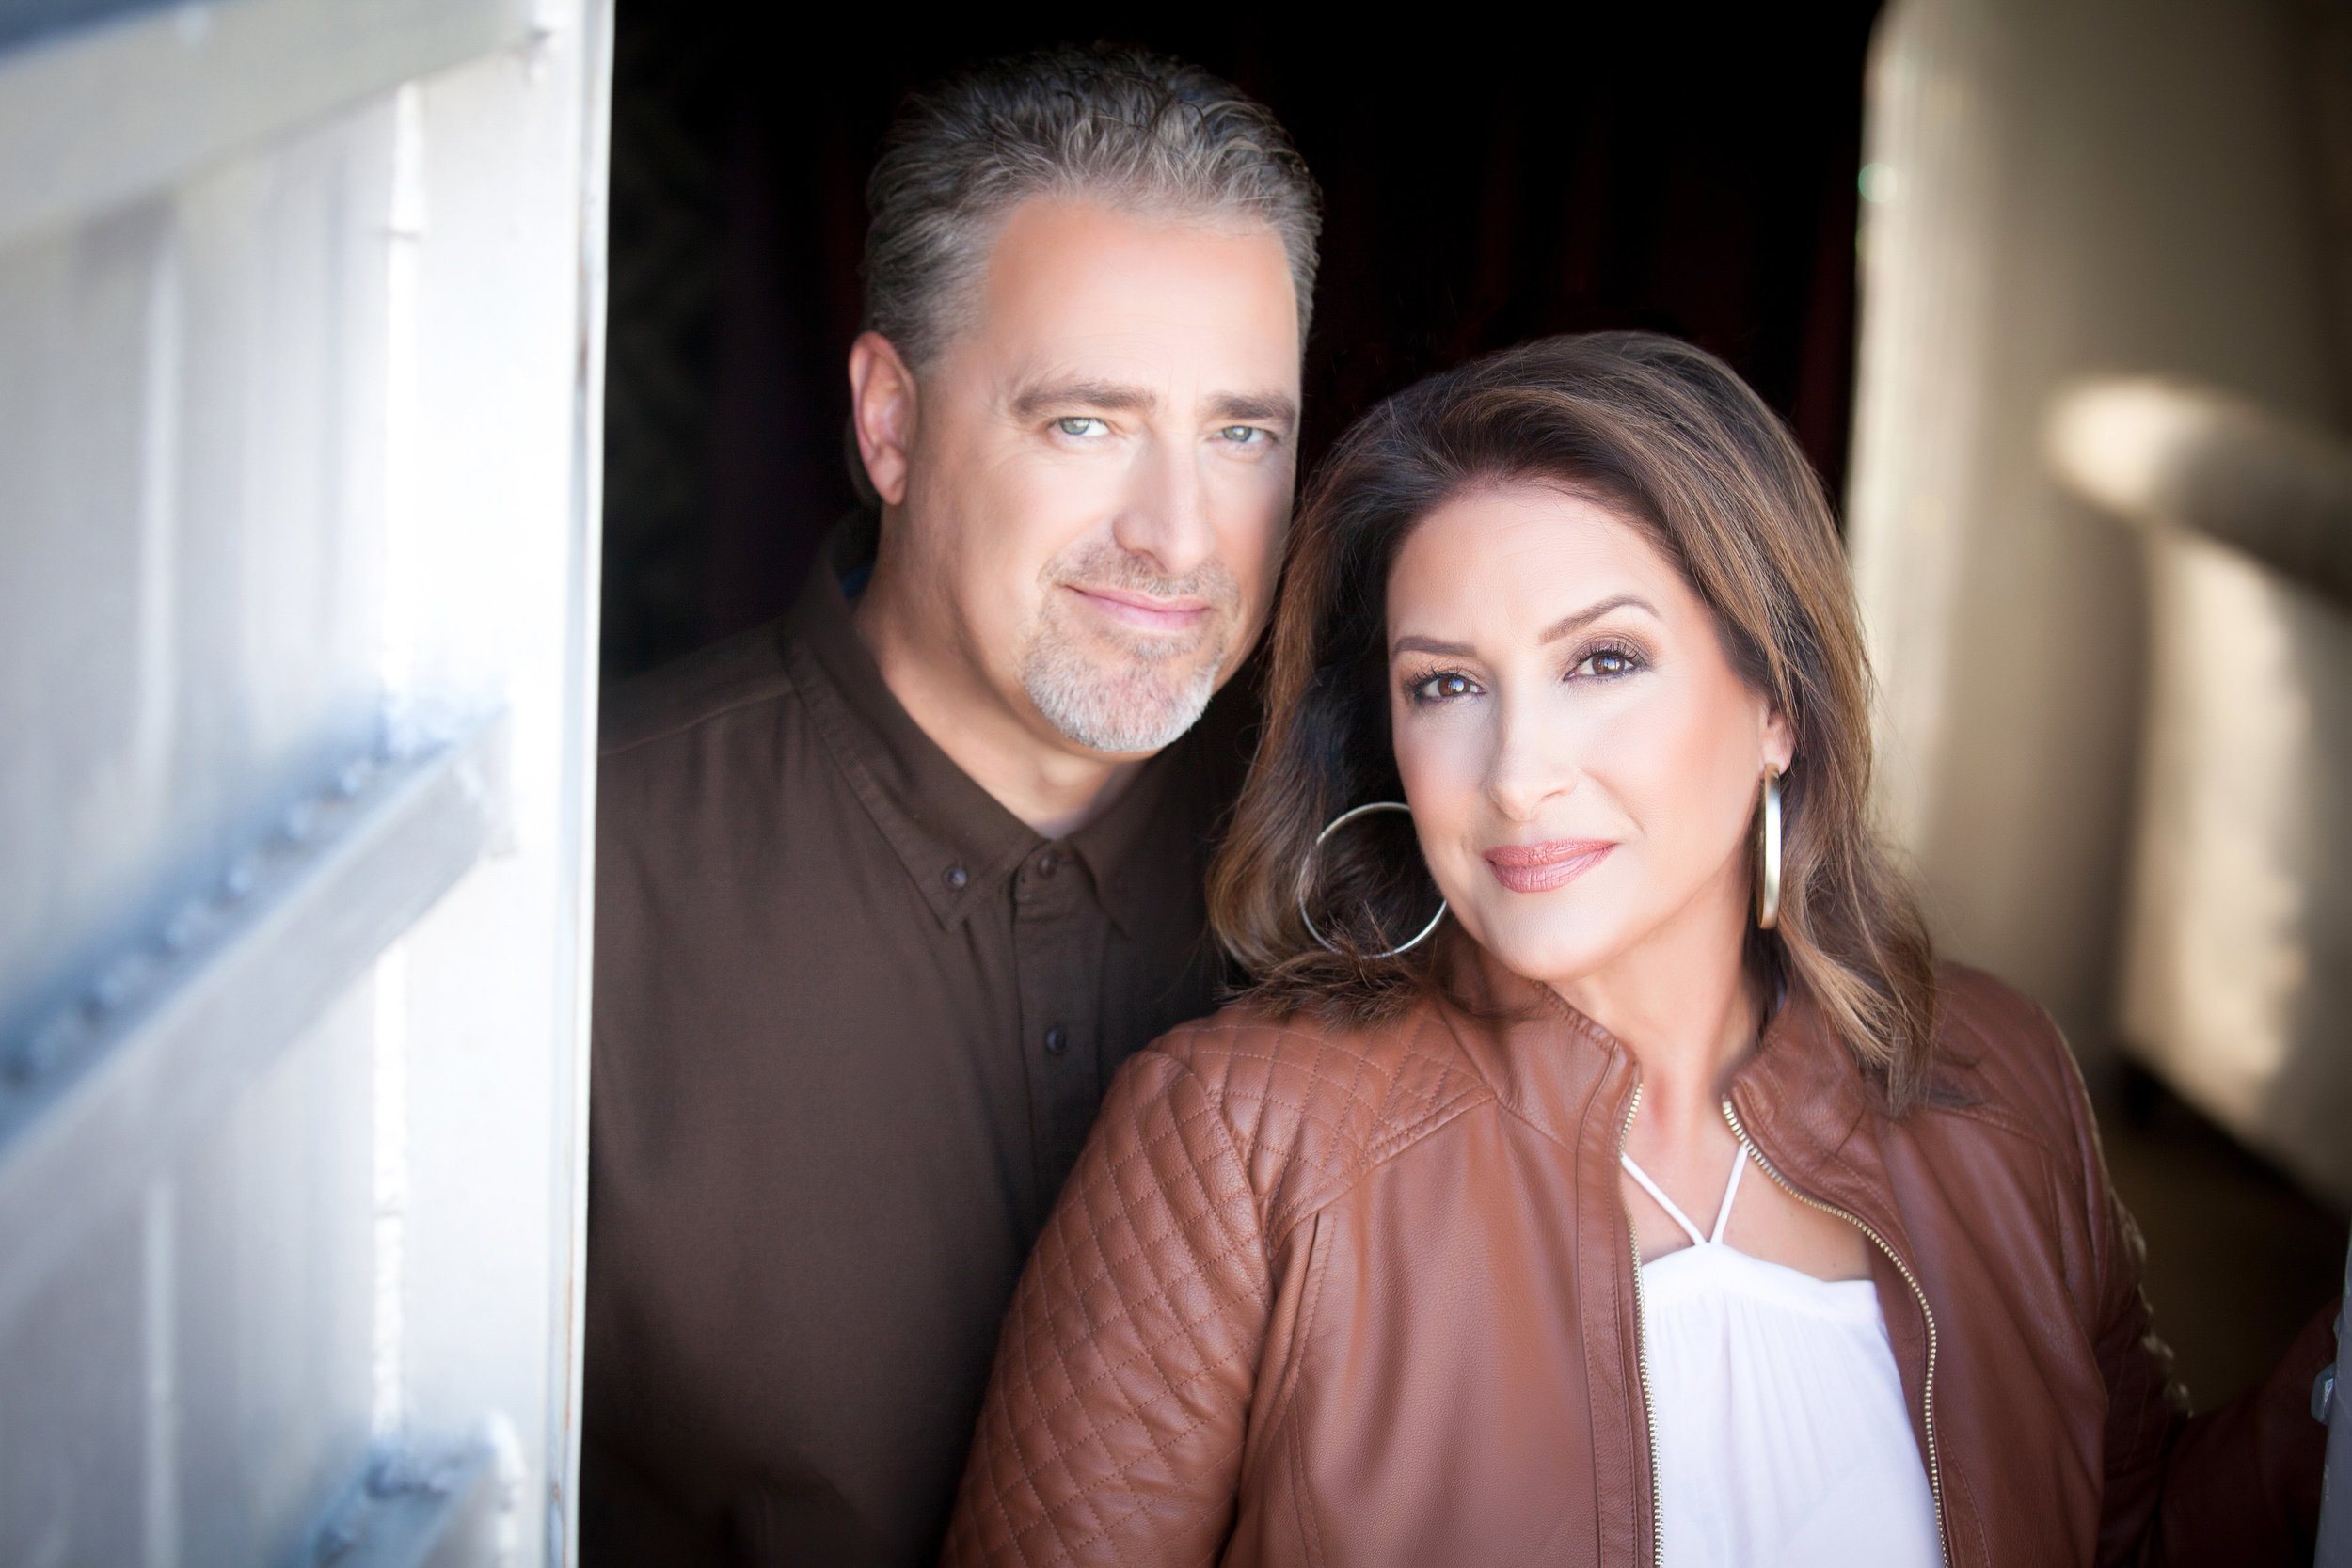 Jed and Claire Seneca